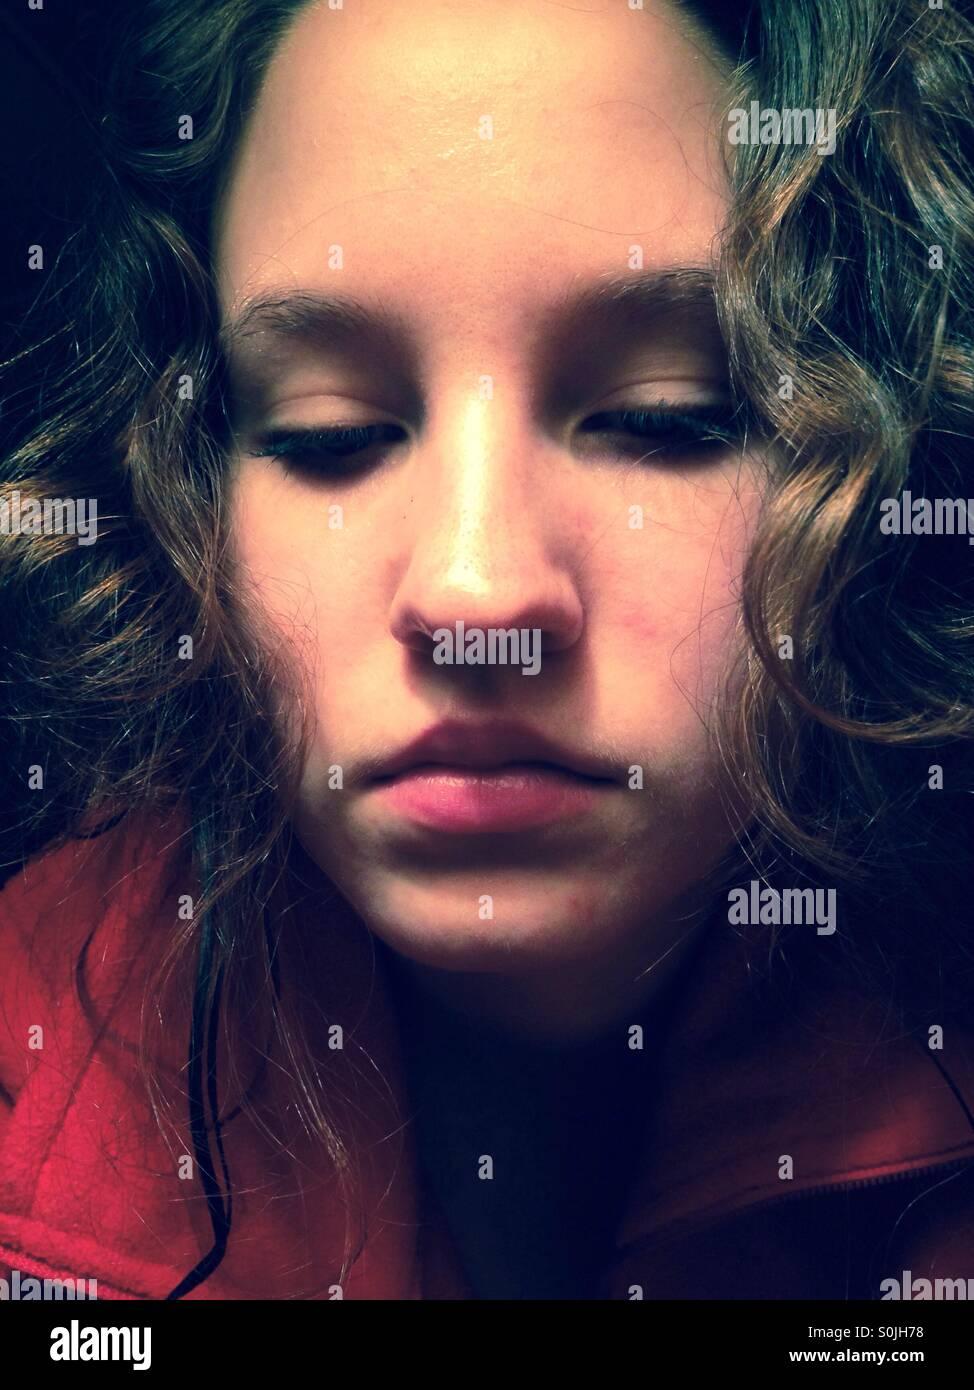 Passive girl - Stock Image